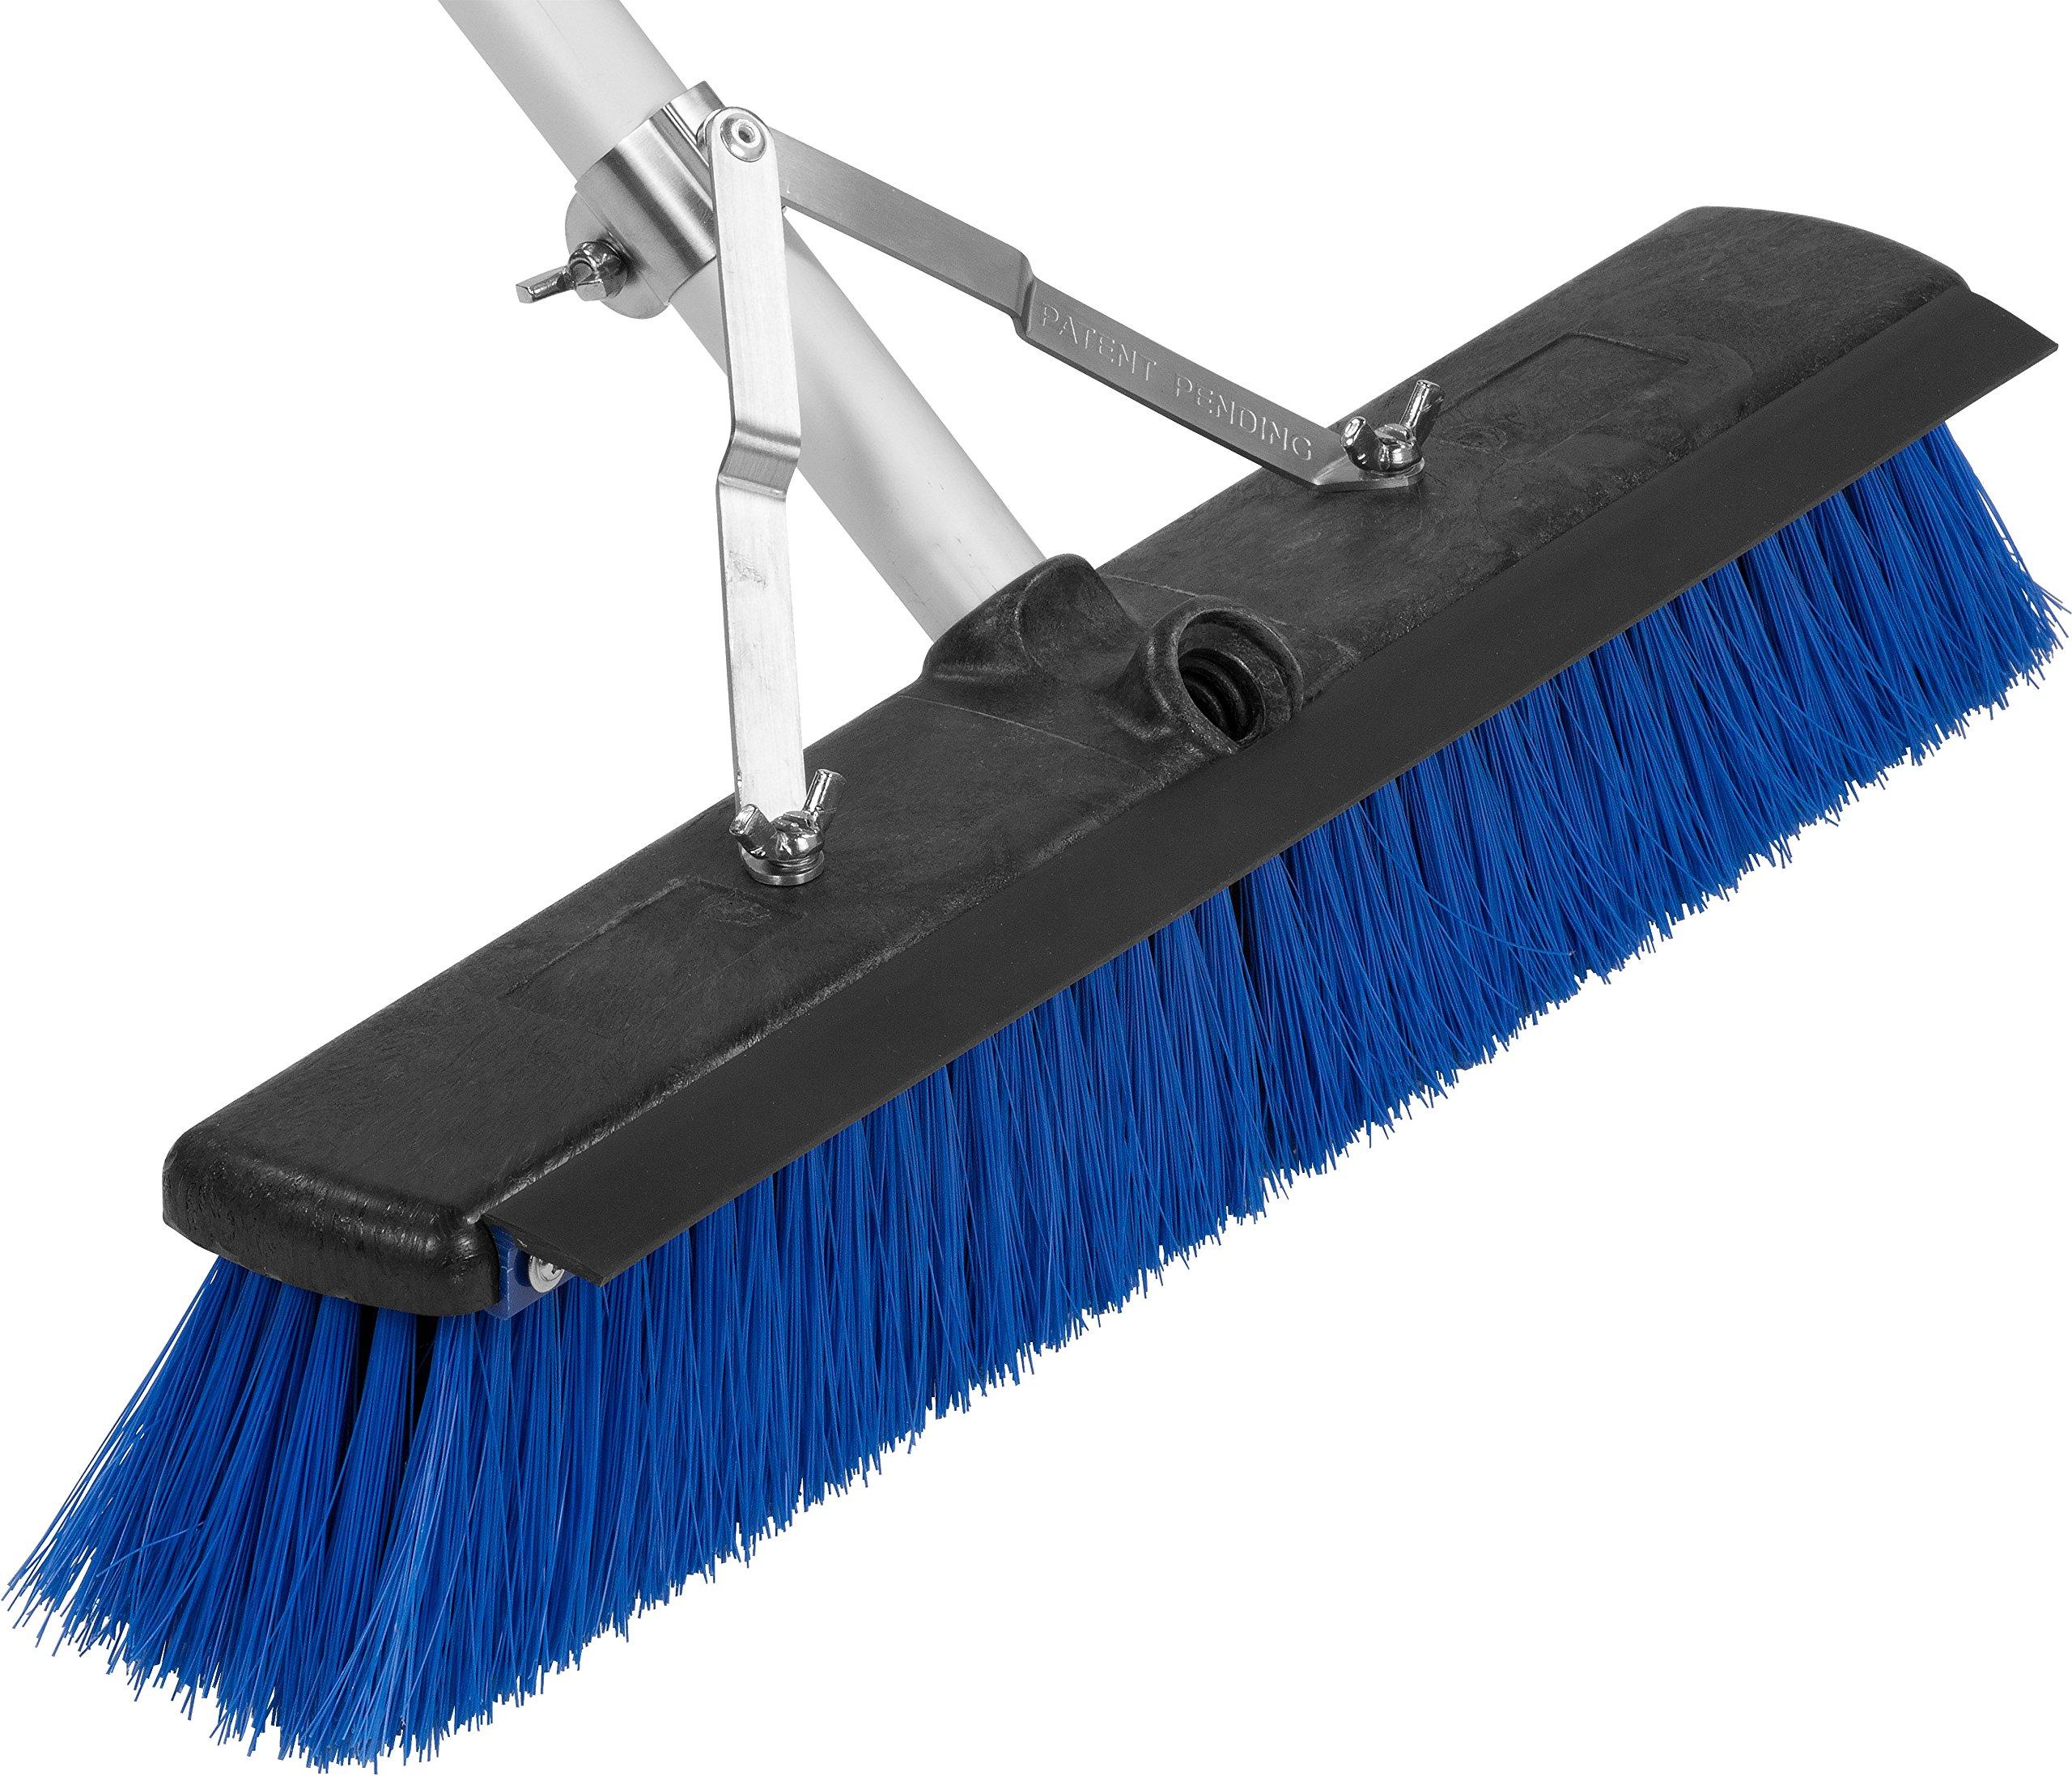 Carlisle 3621961814 Sweep Complete Aluminum Handle Floor Sweep with Squeegee, Plastic Bristles, 18'' Length, 3'' Bristle Trim, Blue